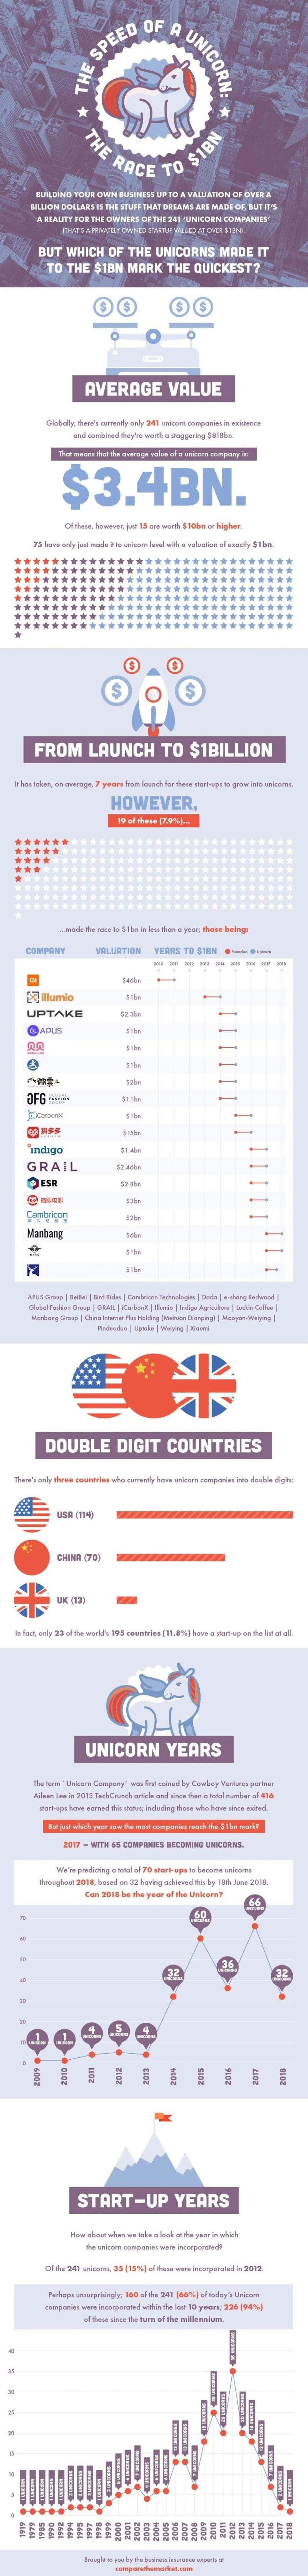 Infografik StartUp Einhörner Unicorns (Bild: CompareTheMarket)